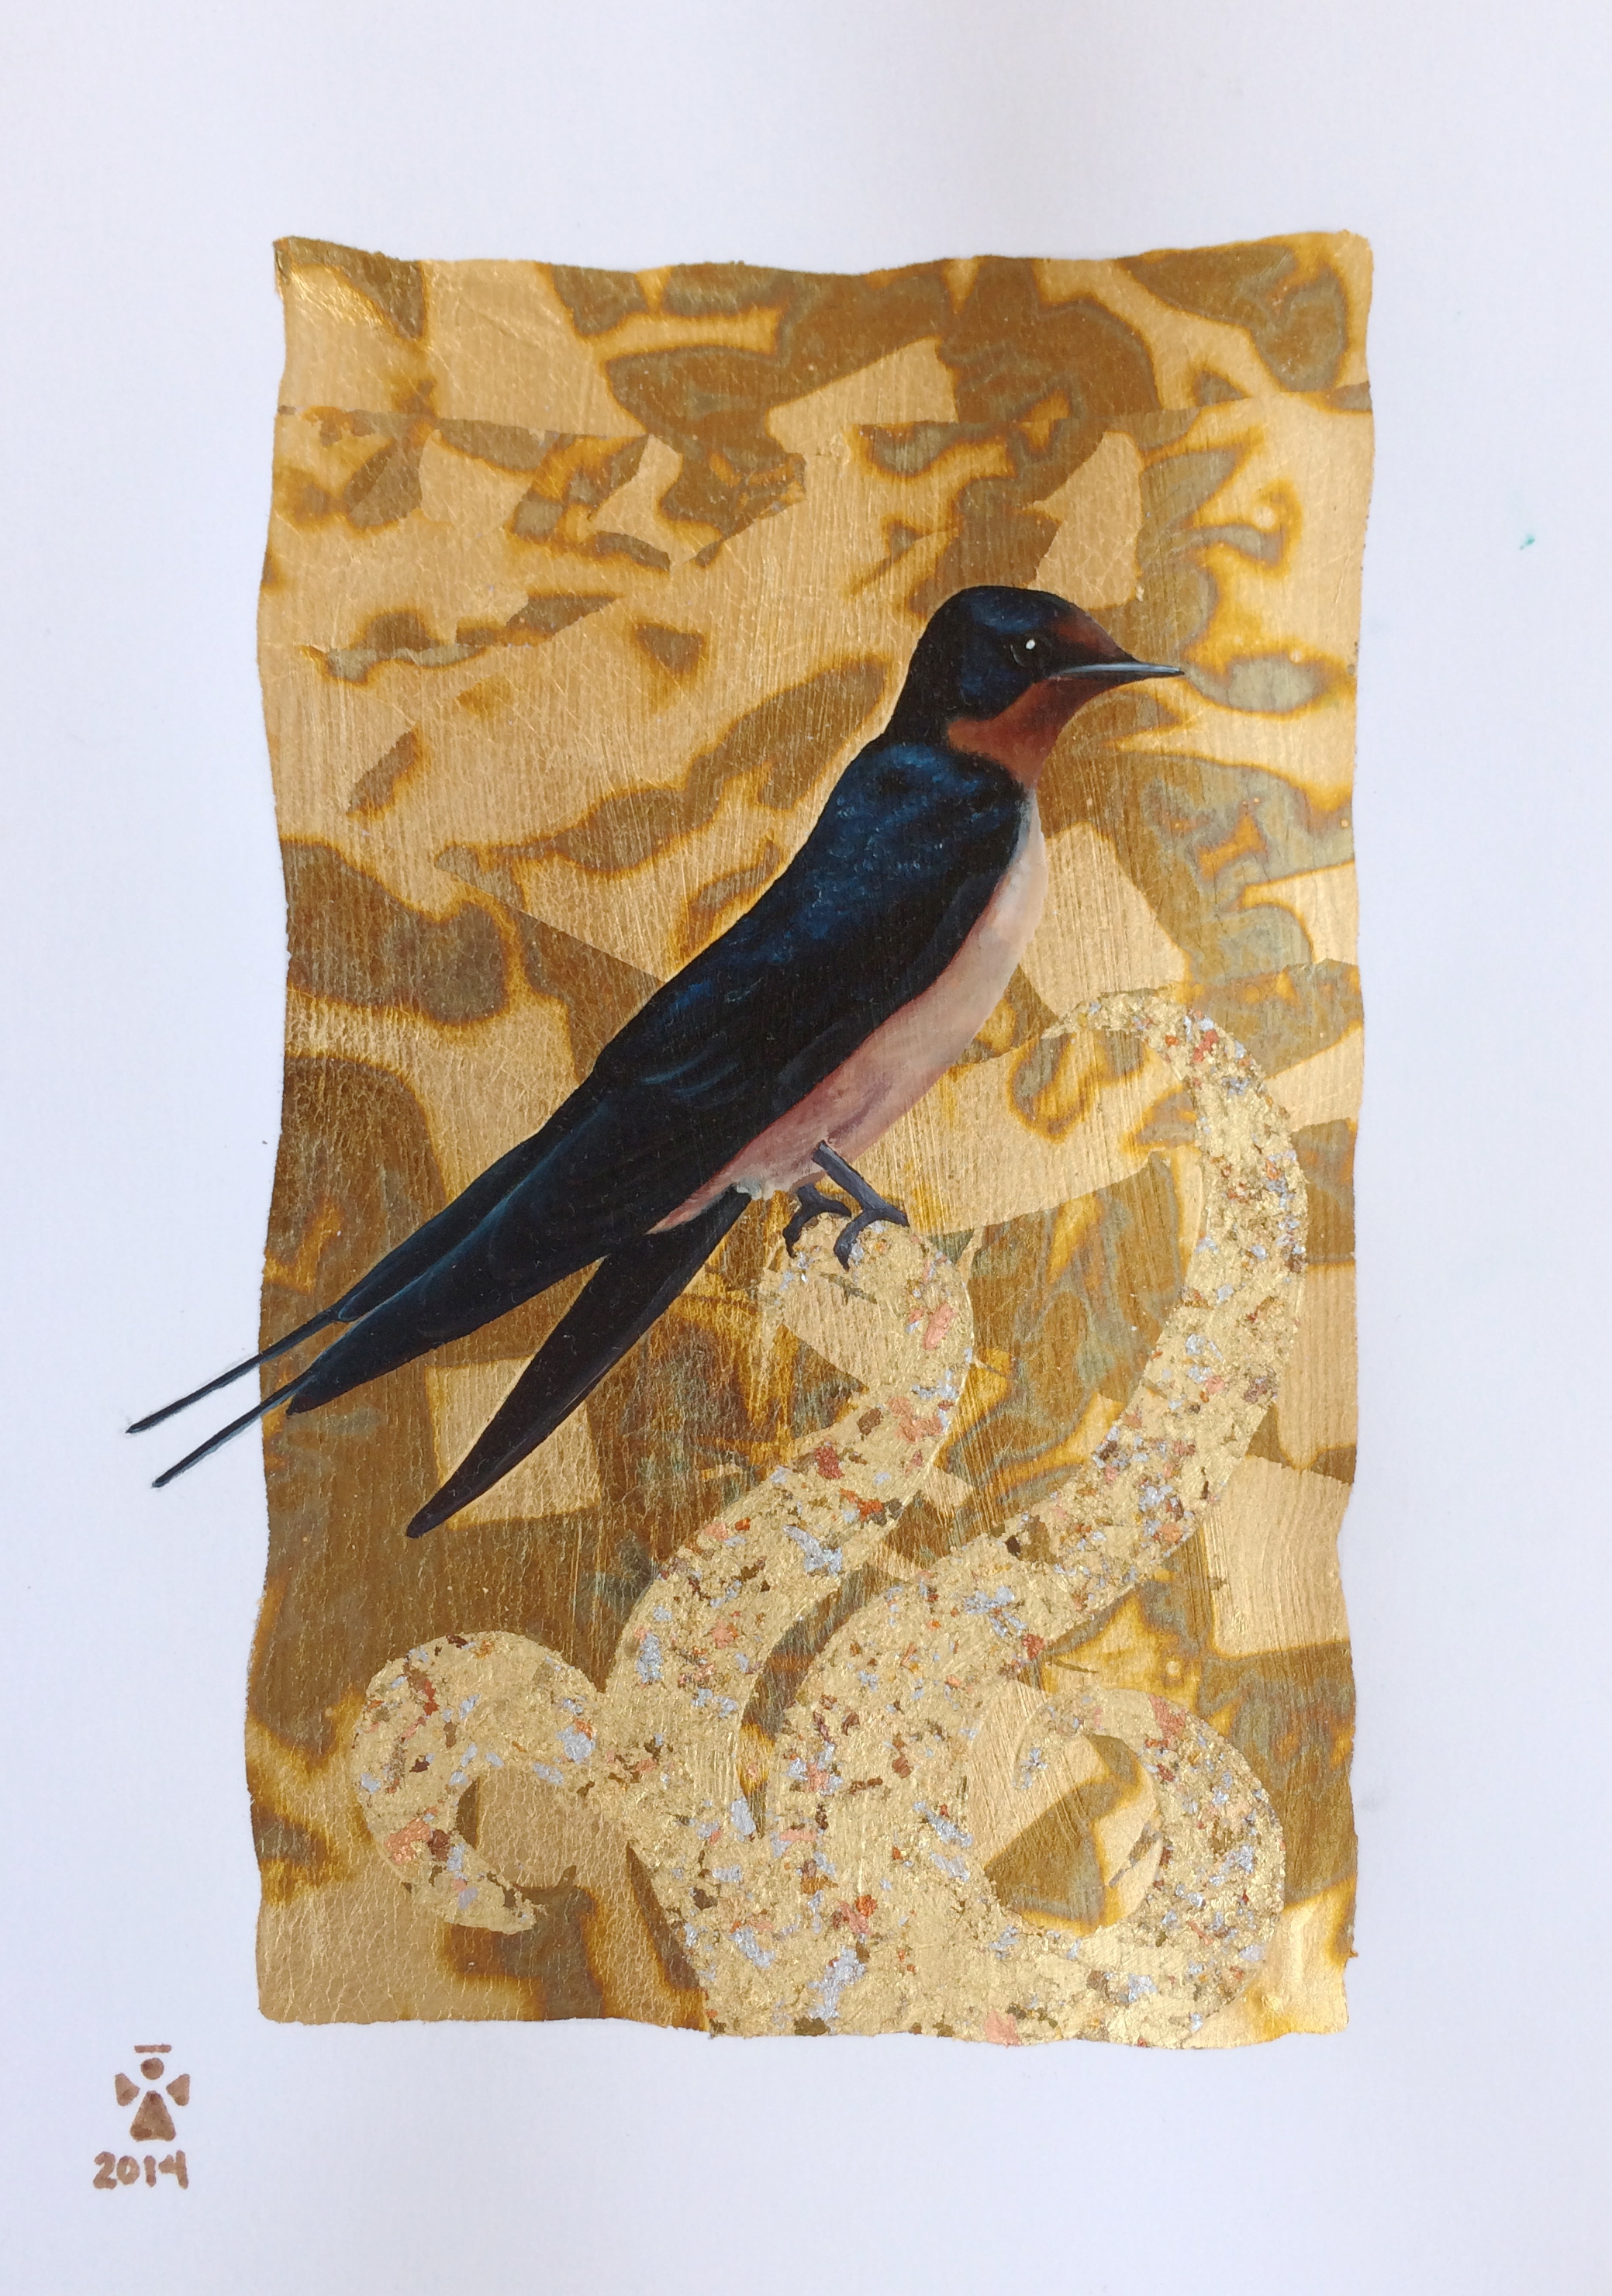 Swallow bird 2 - Angeles Salinas - 12'' x 18'' - Mixed Media on Paper